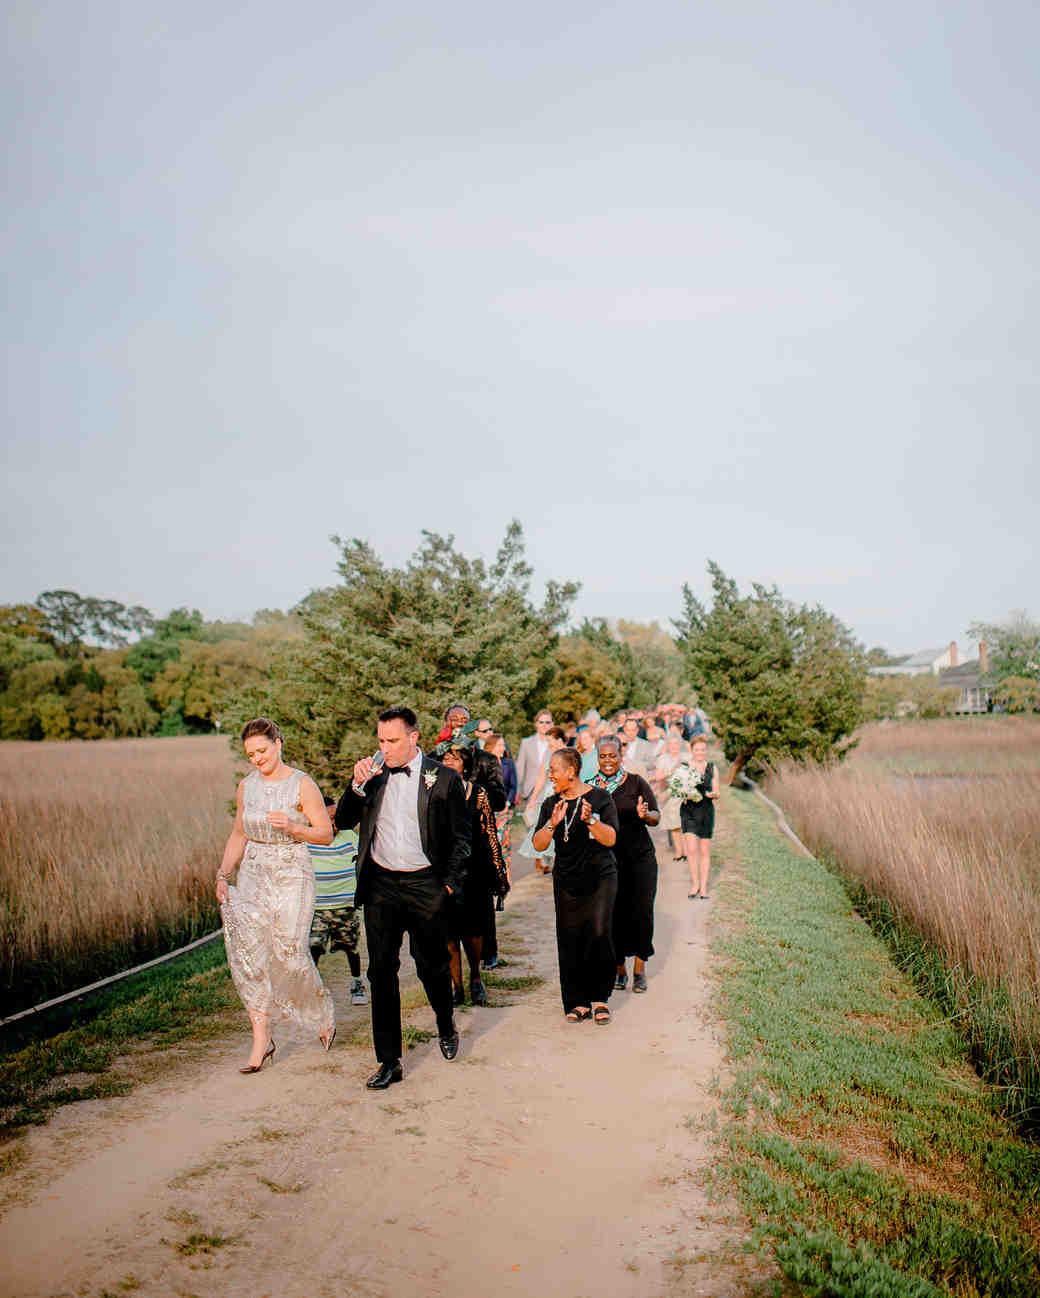 melany-drew-wedding-walking-084-s112184-0915.jpg